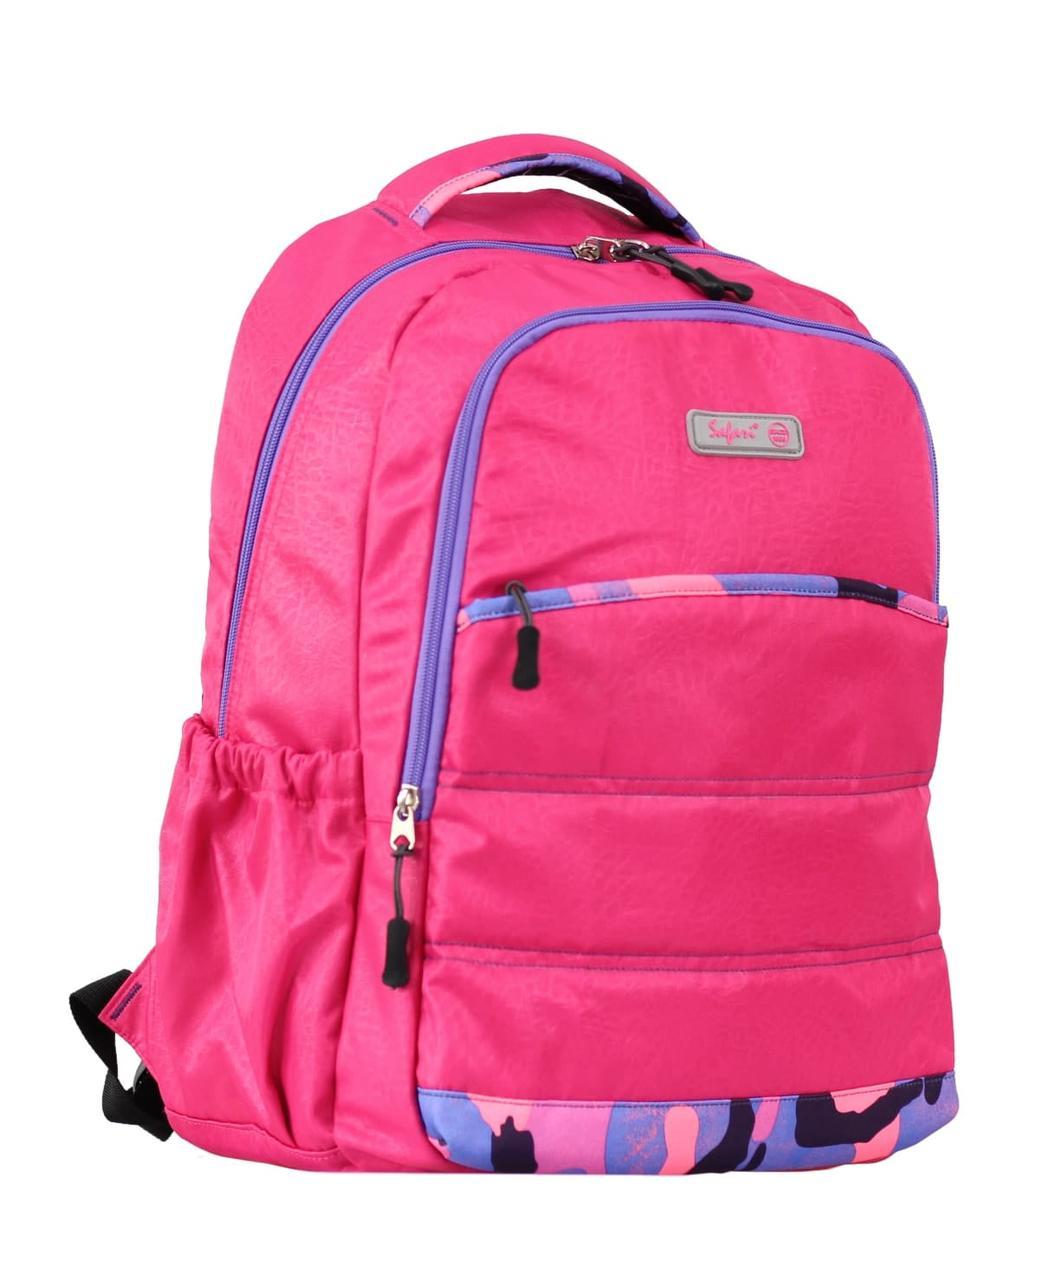 Рюкзак 3 отд 45*29*22 см 900D PL SAFARI Trend 1843